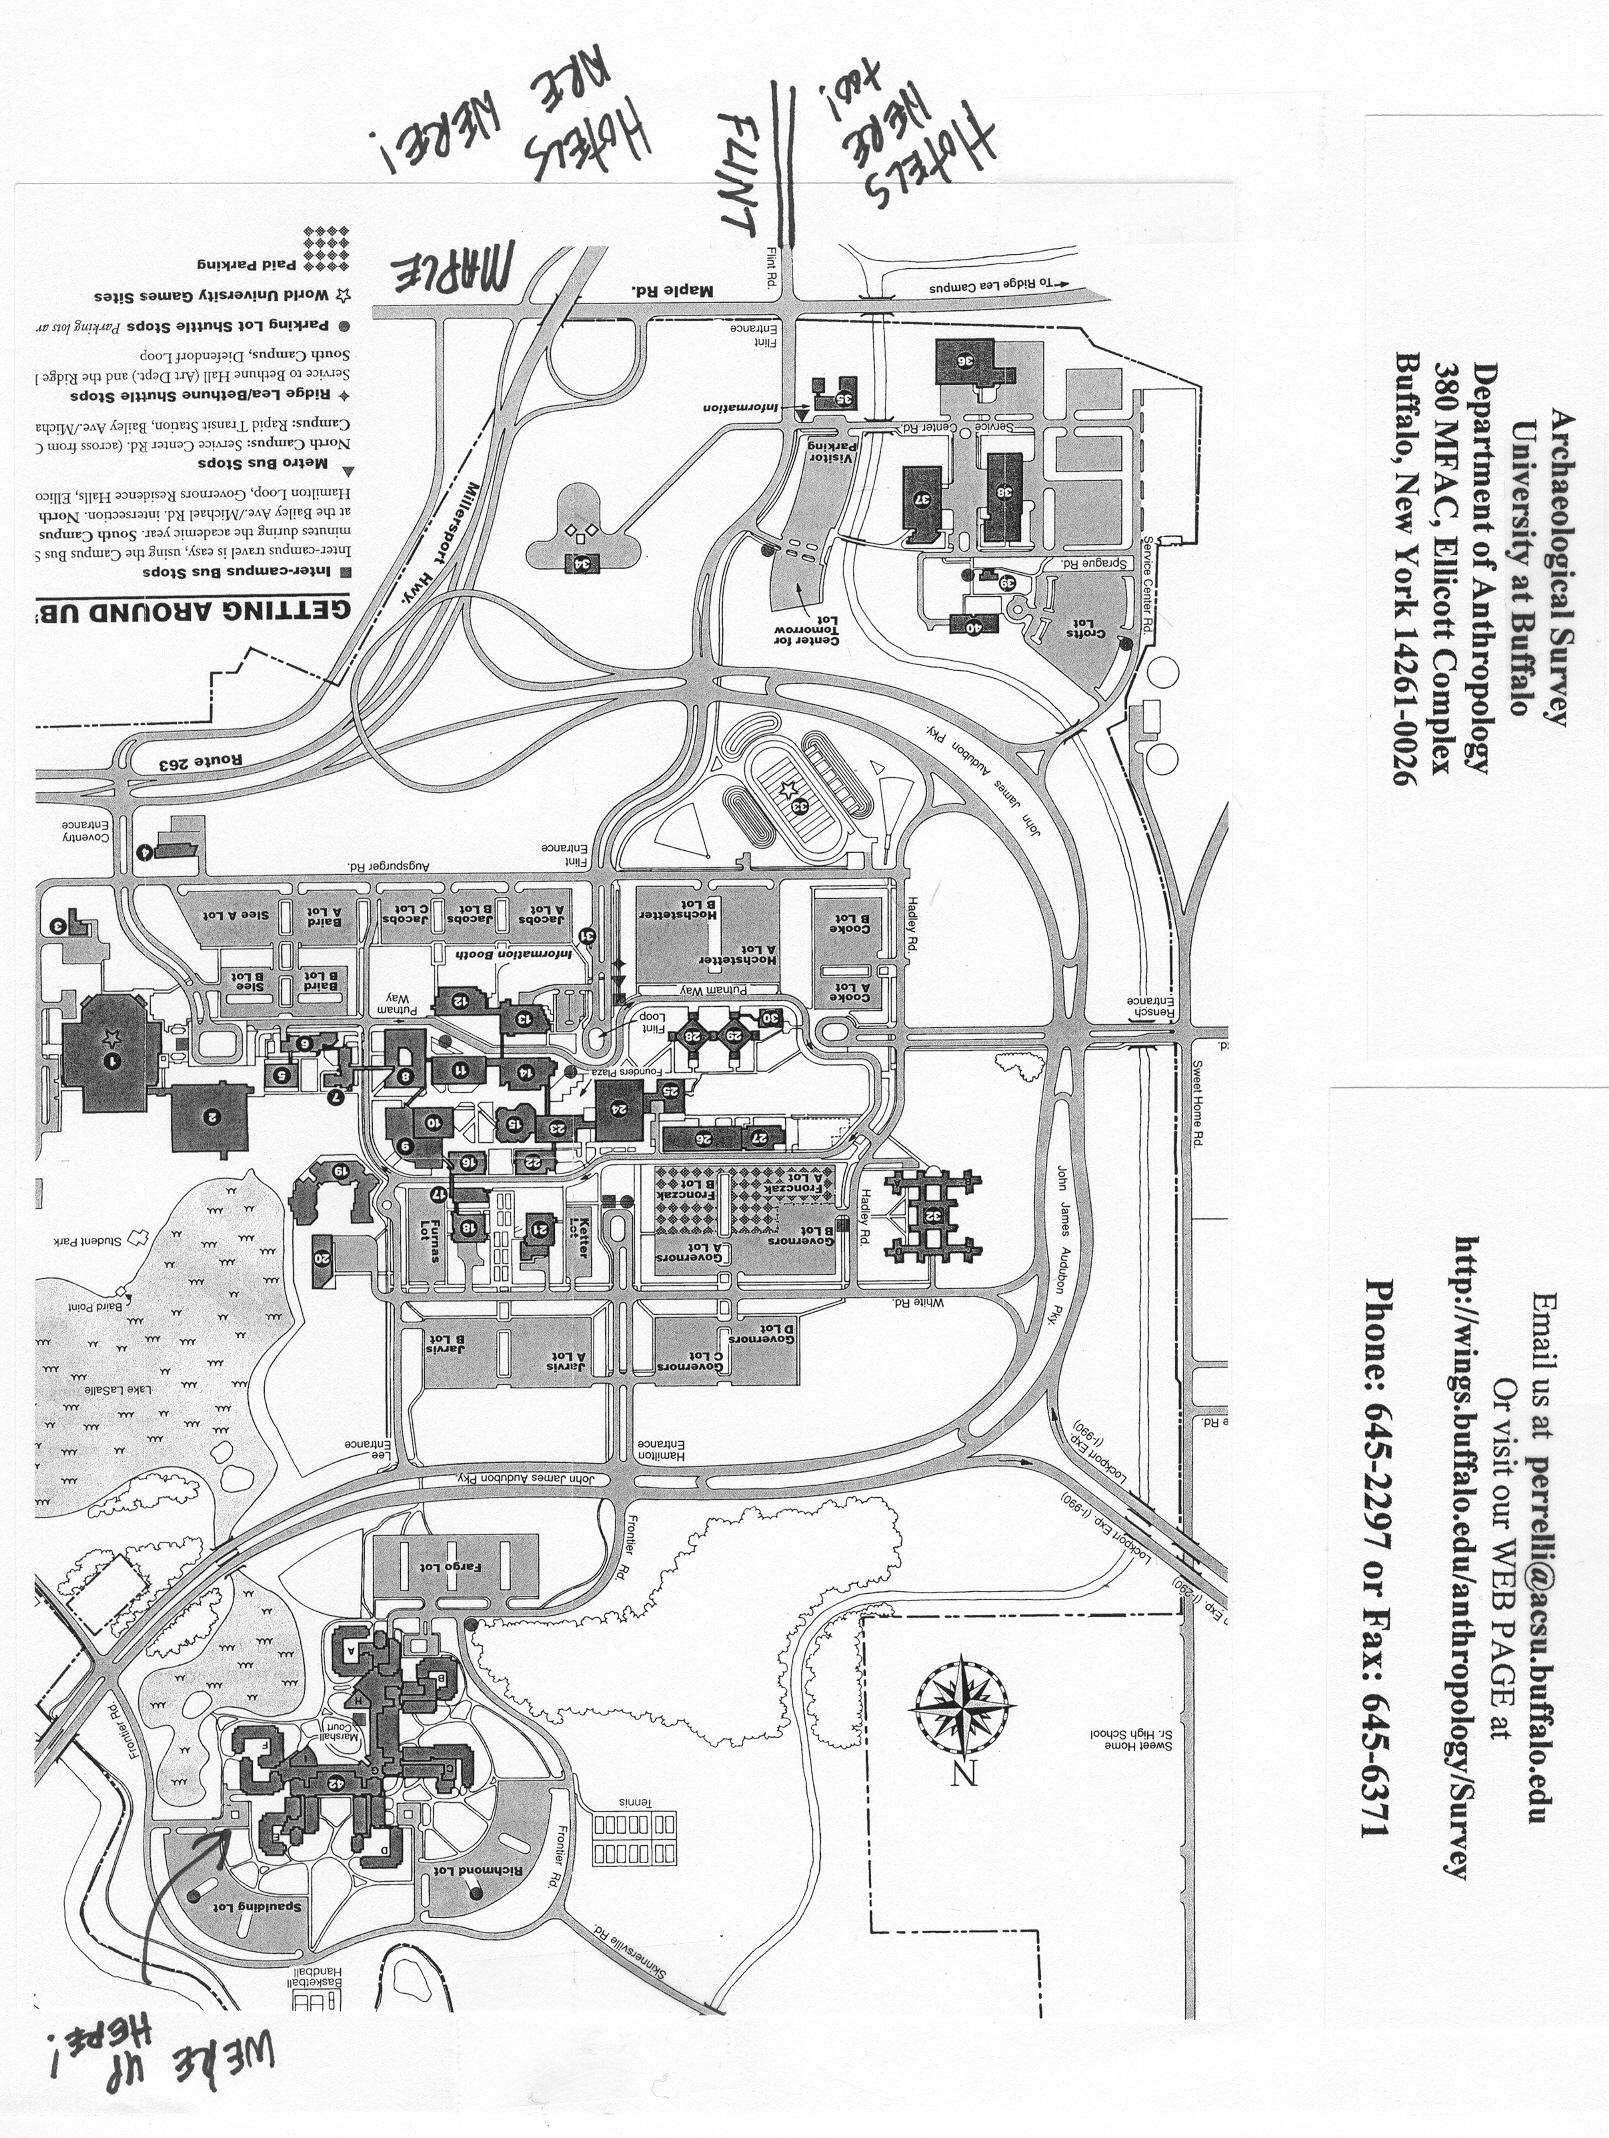 Suny Buffalo Campus Map.Ub North Campus Map